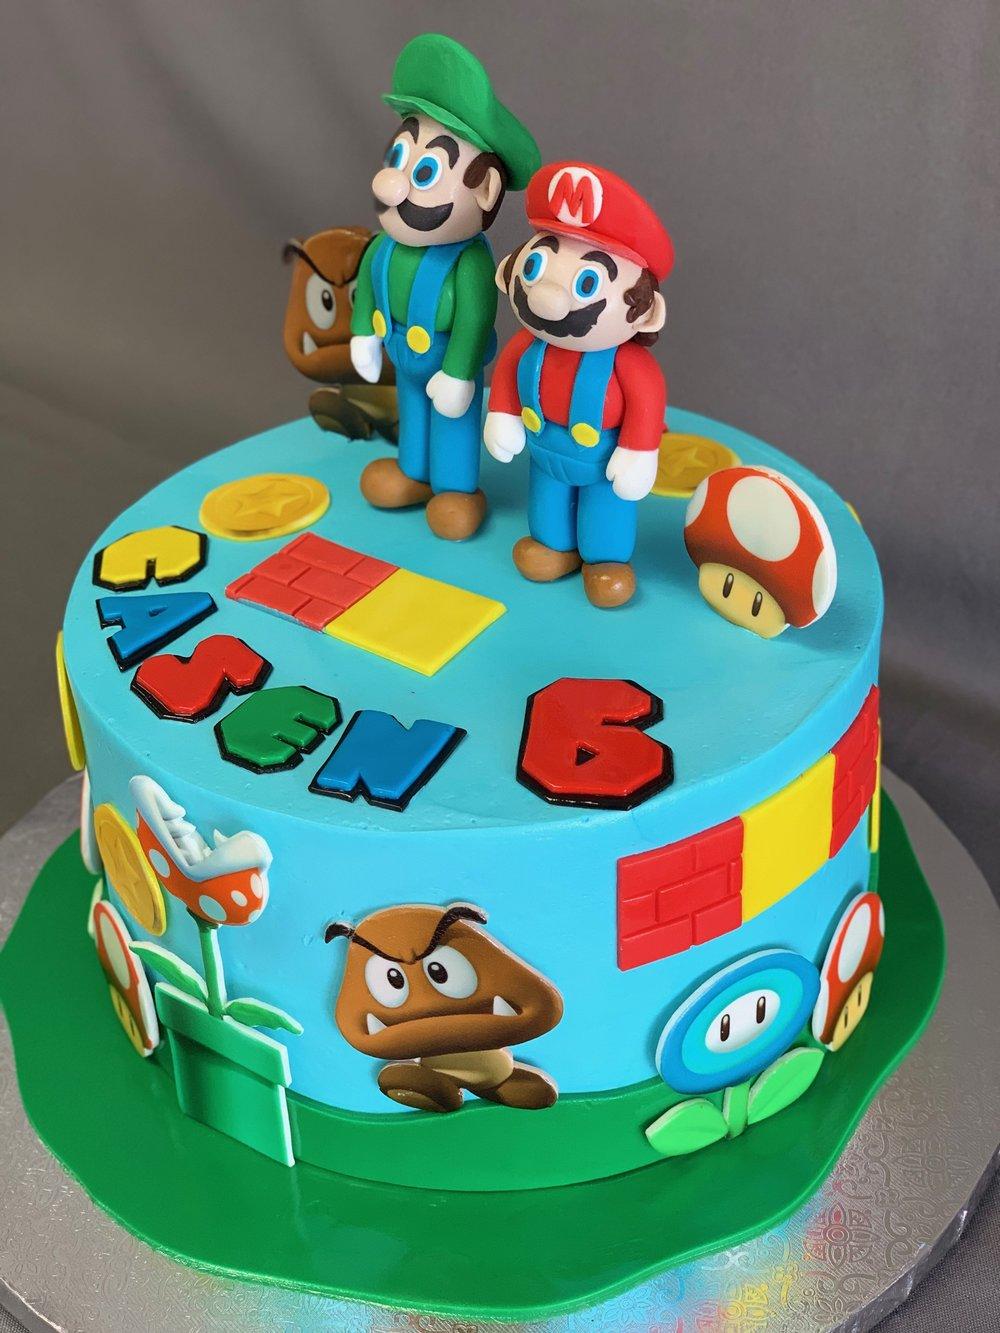 Super Mario Birthday Cake NJ